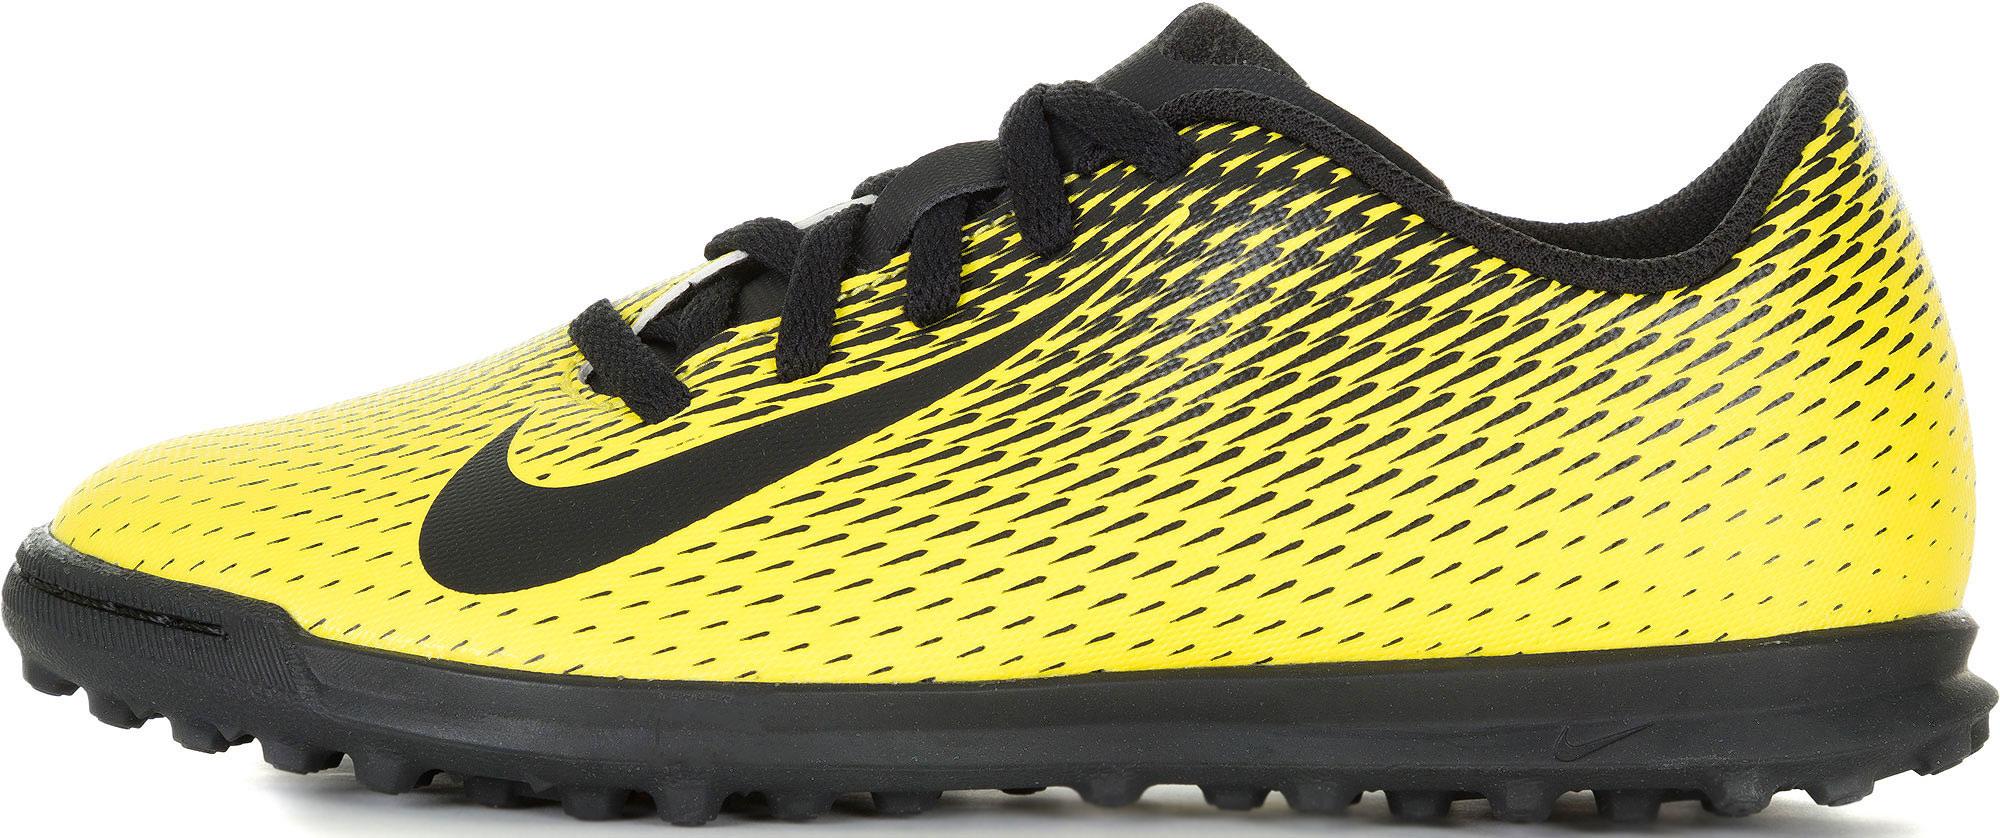 Nike Бутсы для мальчиков Nike Bravata II TF, размер 37,5